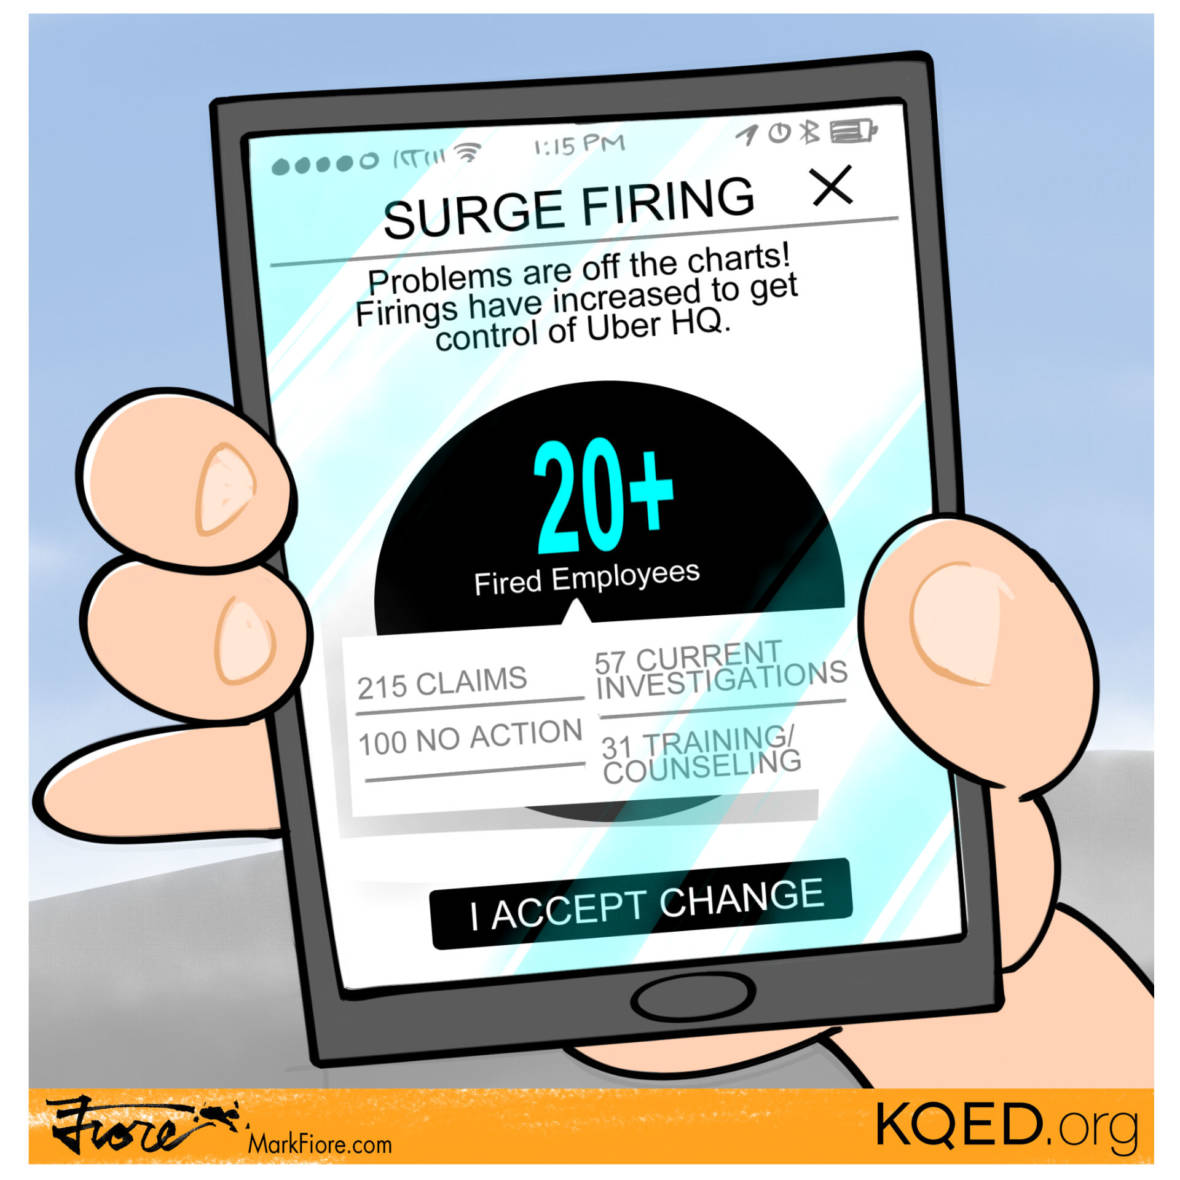 Surge Firing at Uber